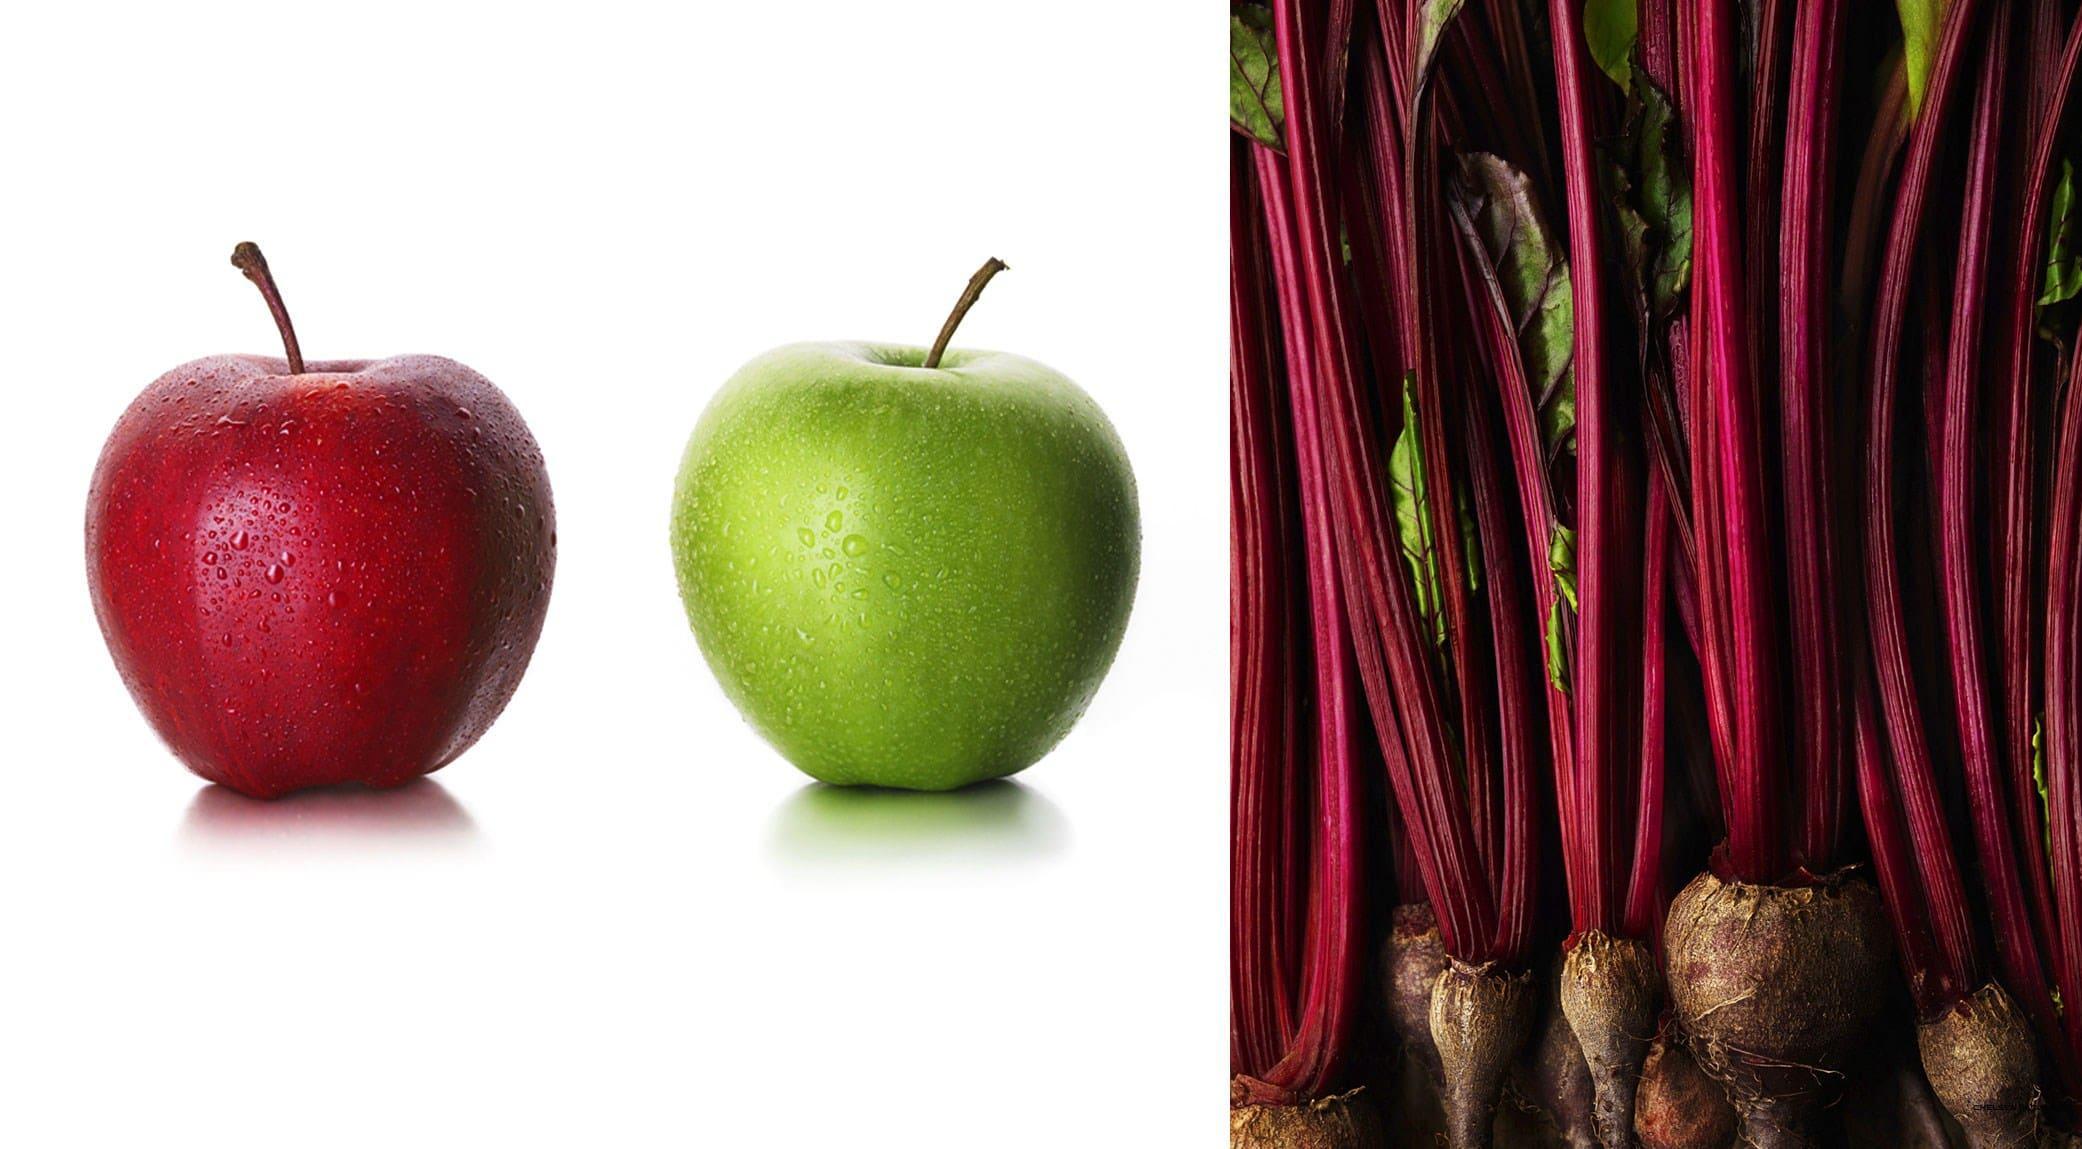 original_apples.jpg